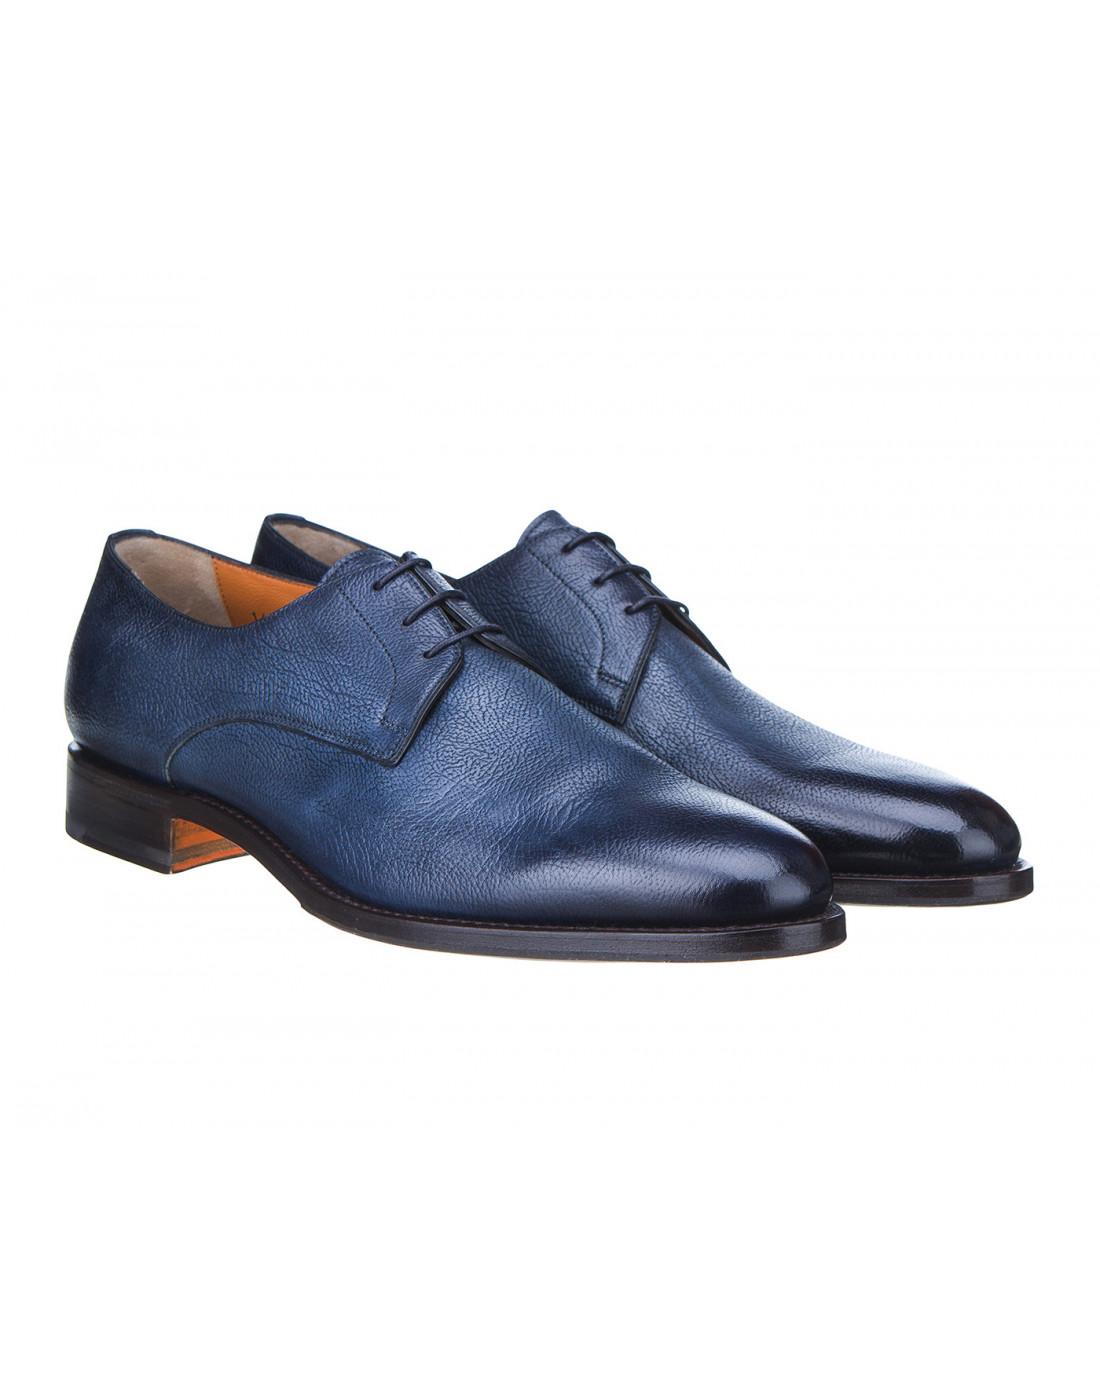 Туфли синие мужские Santoni S14303-2